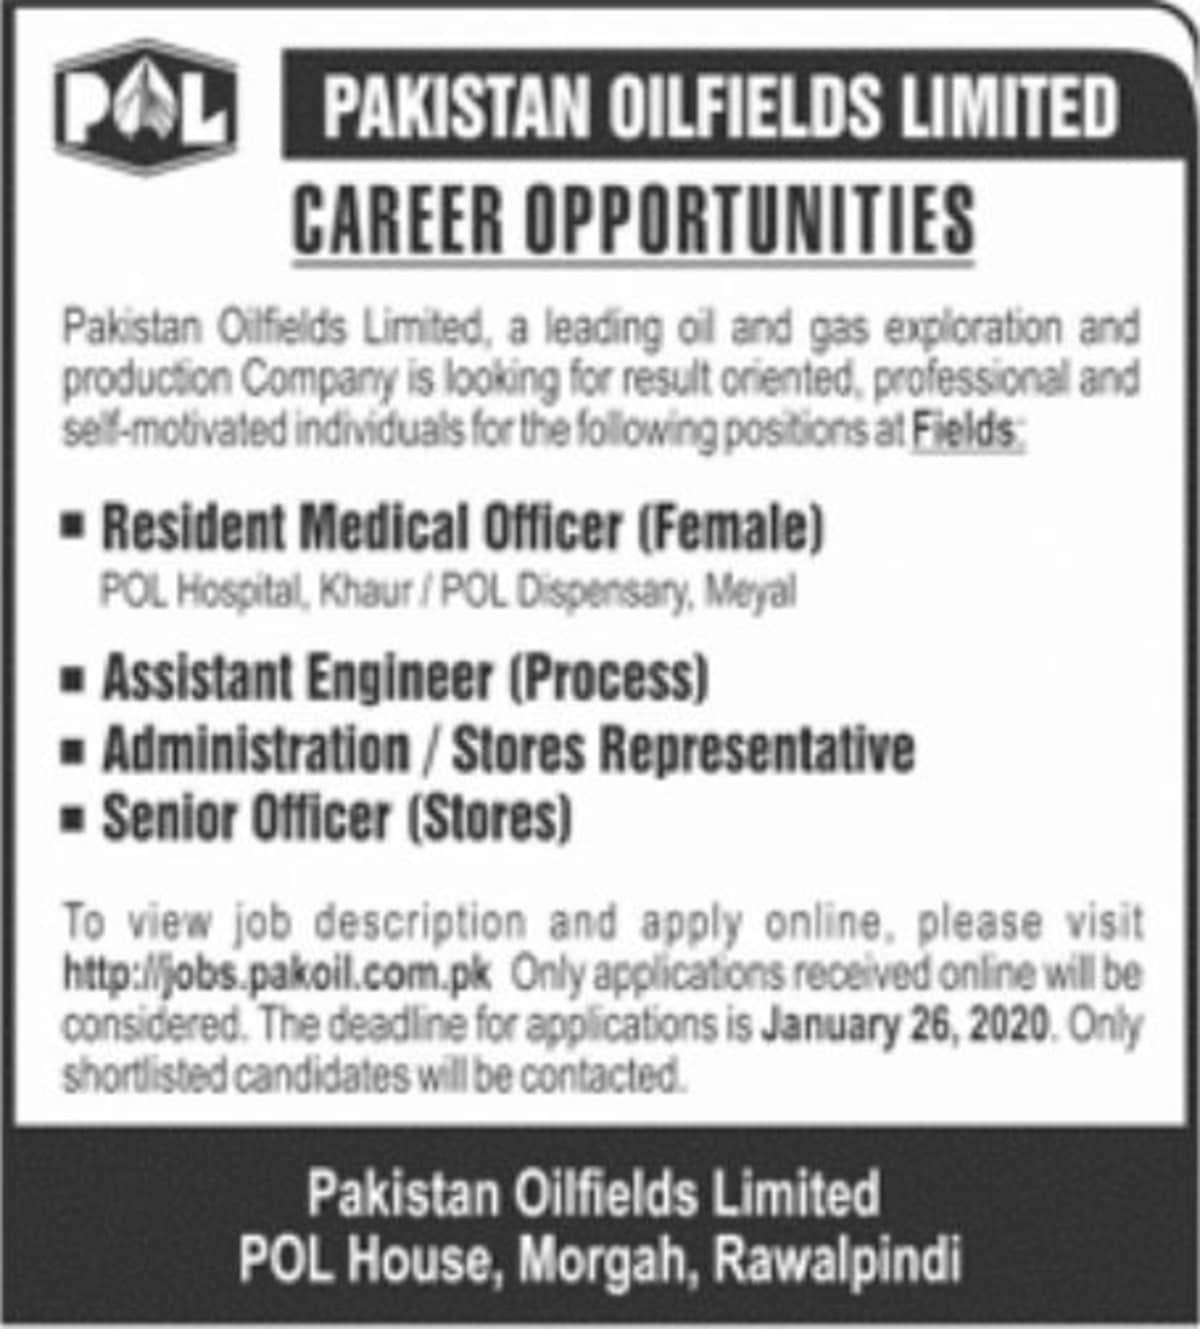 Pakistan Oilfields Limited POL Jobs January 2020 Apply Online